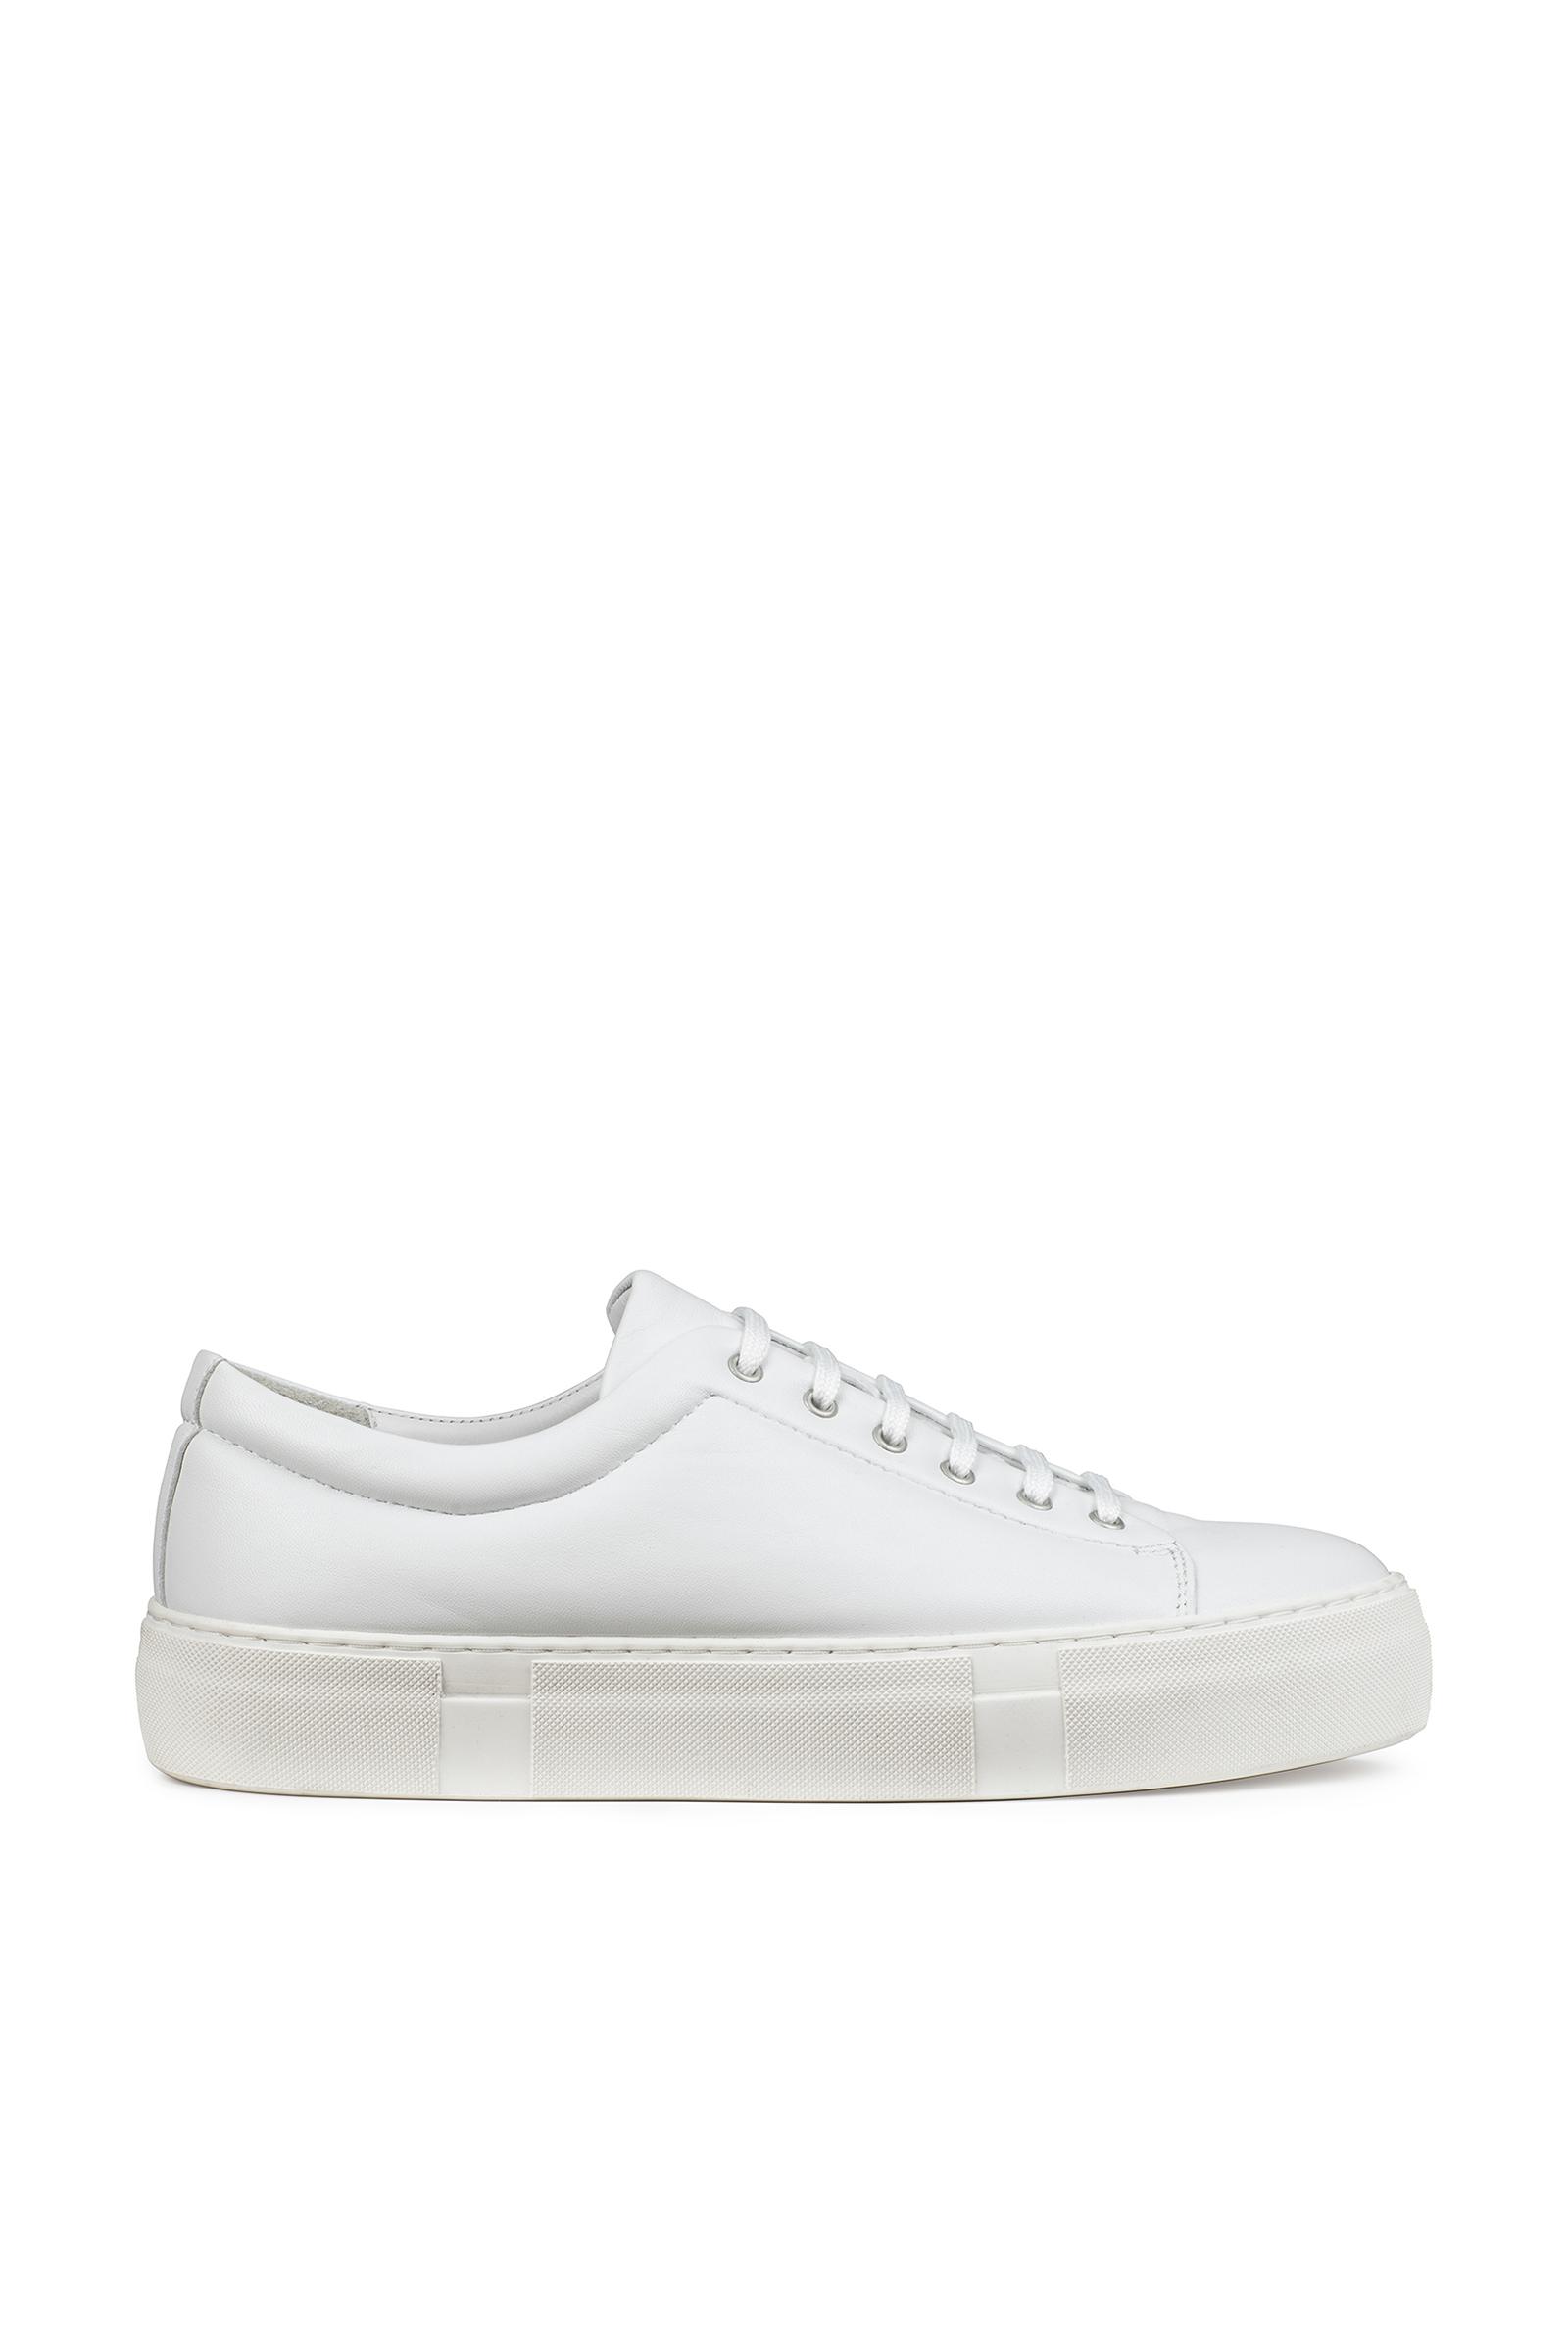 Sid Sneaker White